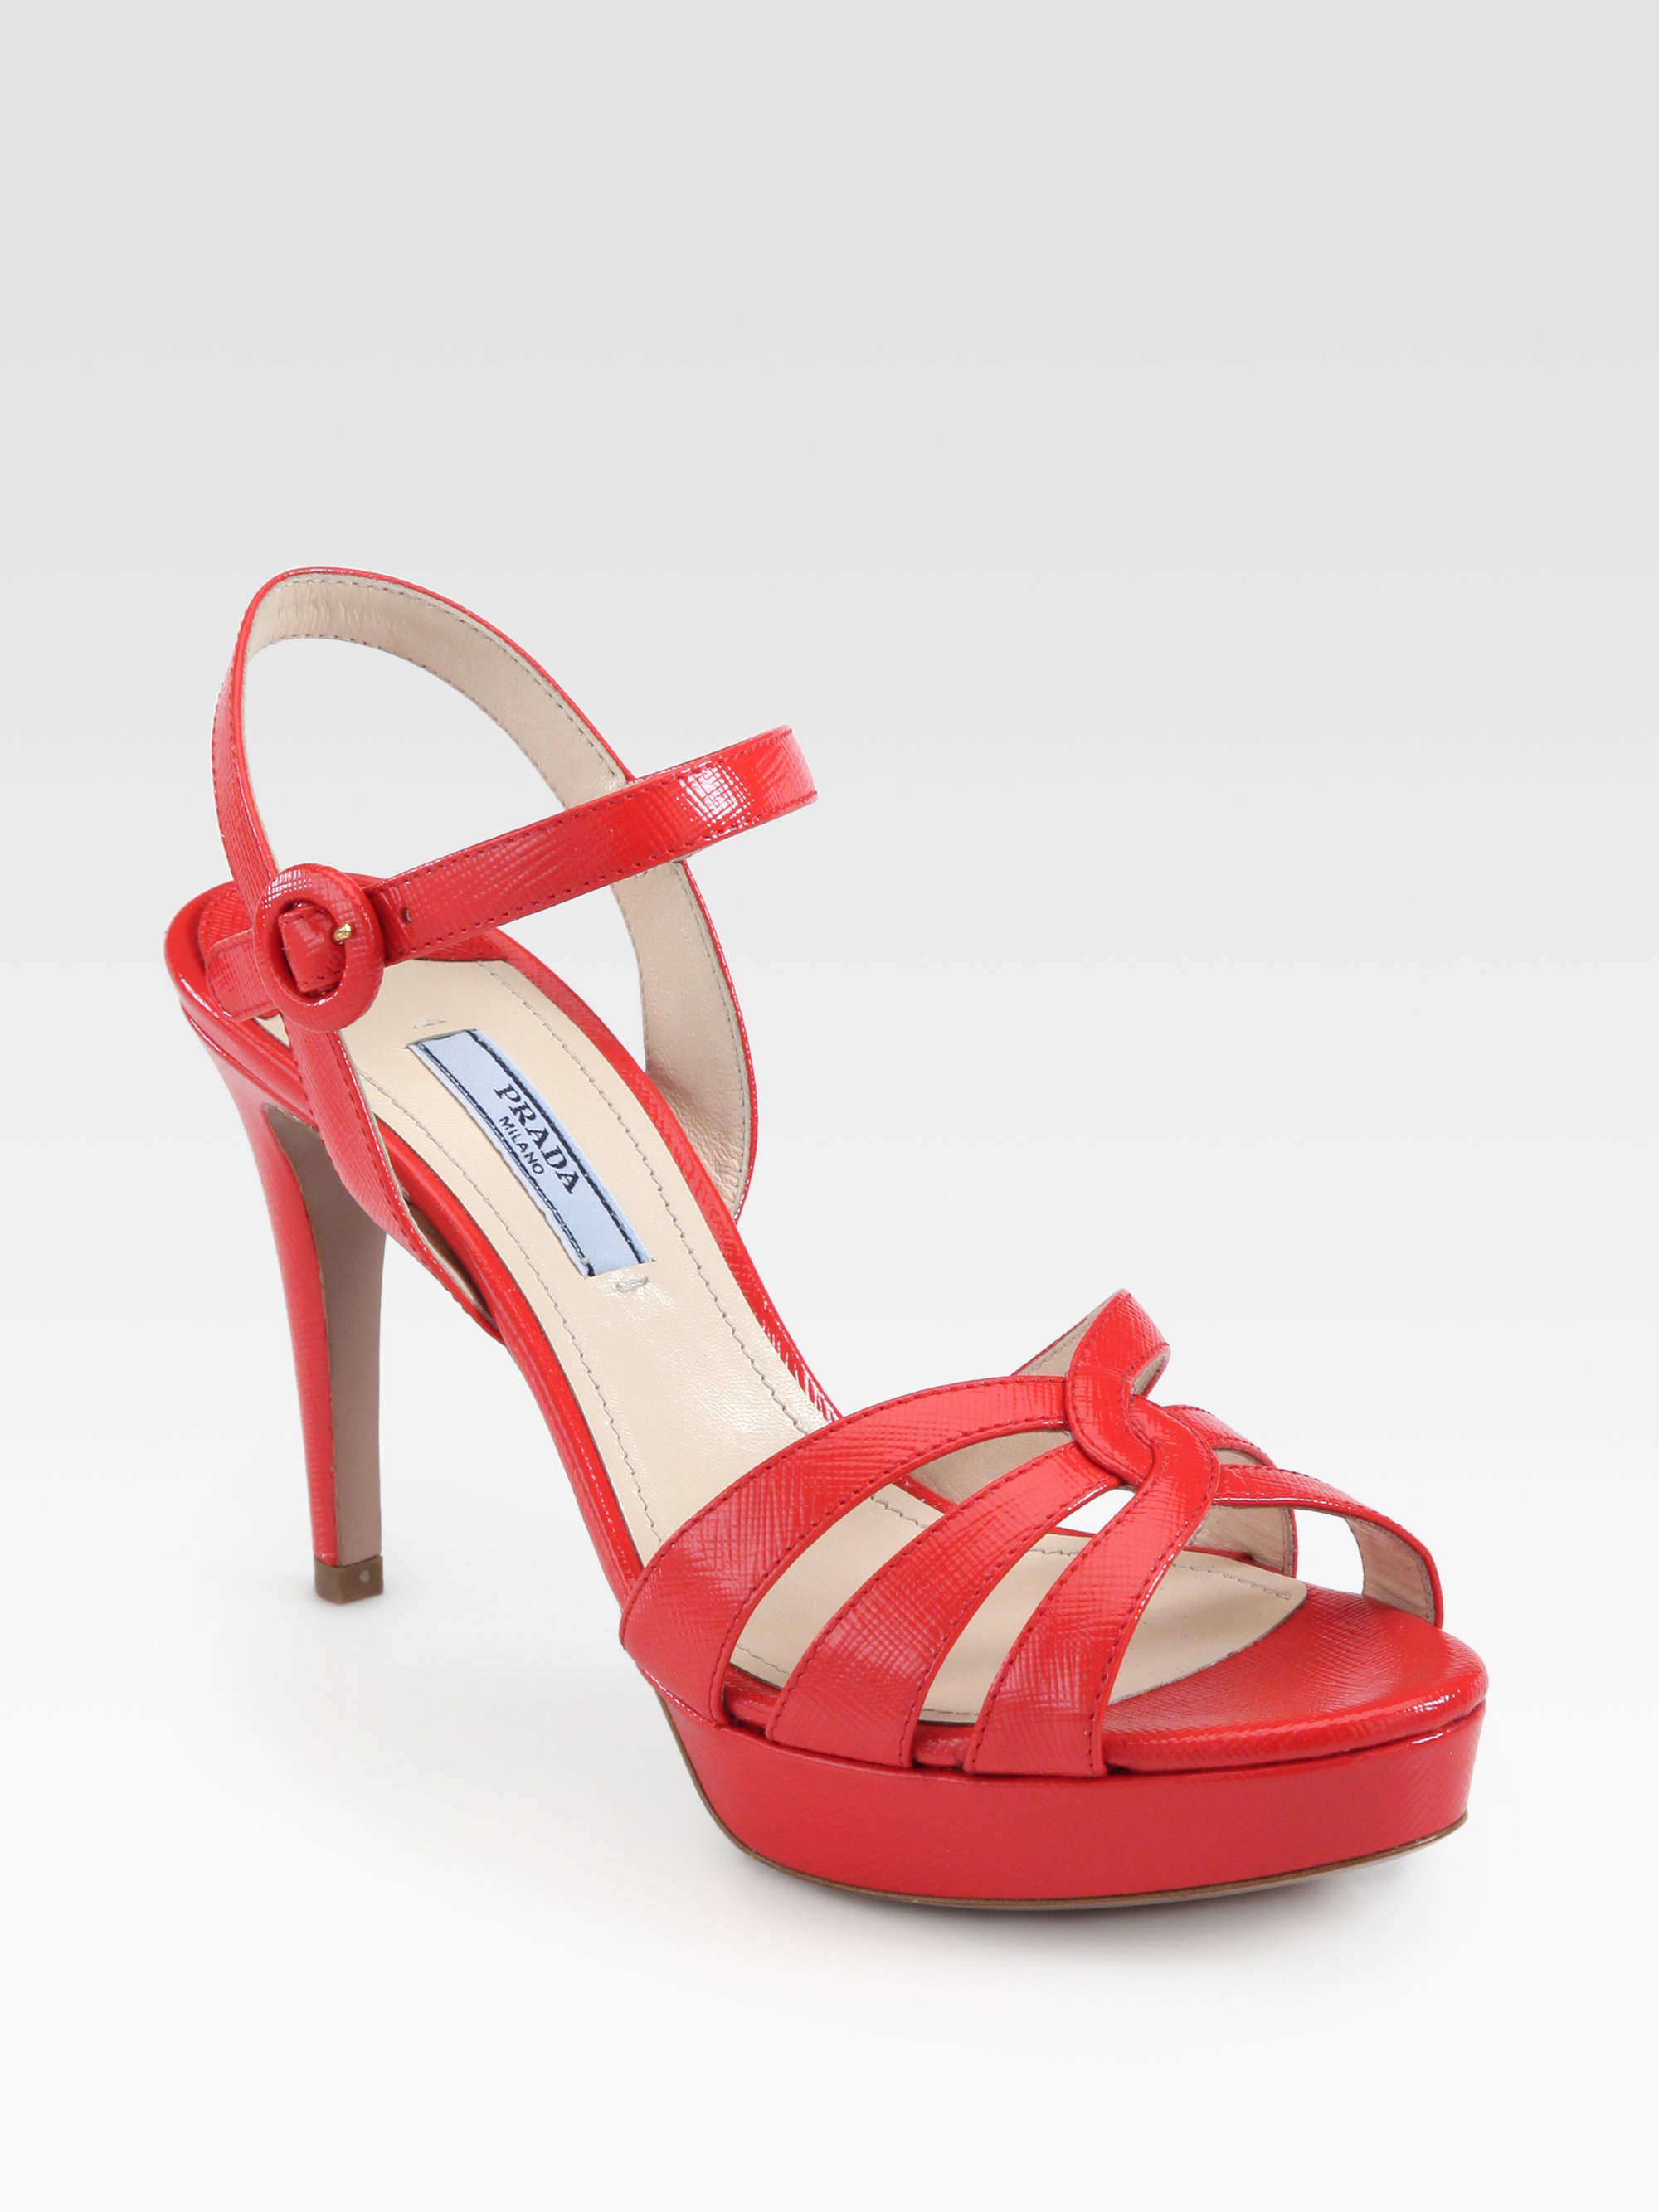 2ec85bfef13 Lyst - Prada Saffiano Leather Strappy Platform Sandals in Red